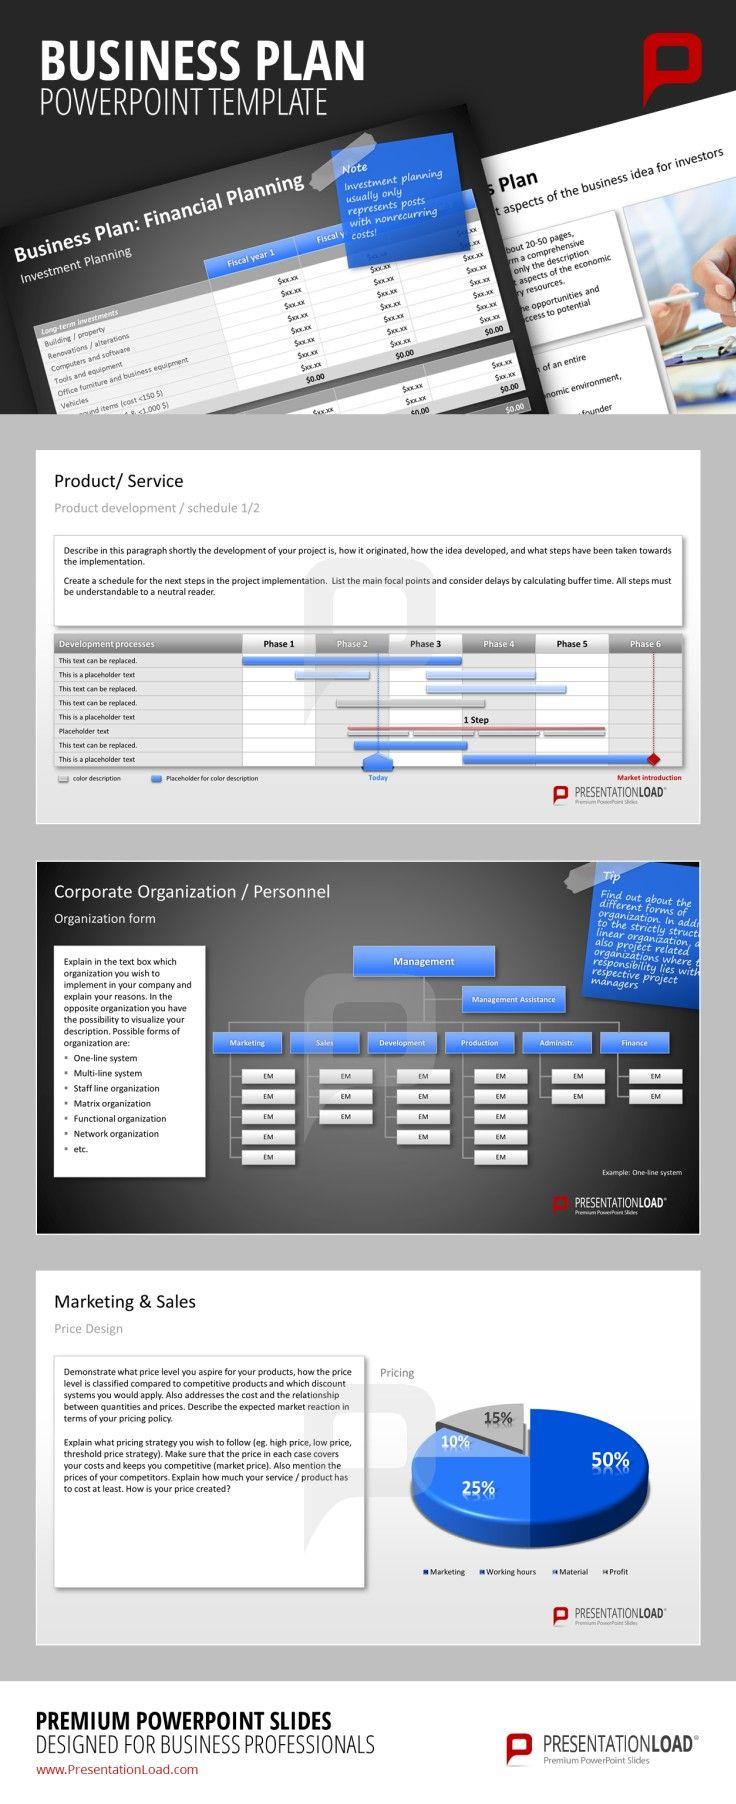 sales manager business plan ppt slideshare